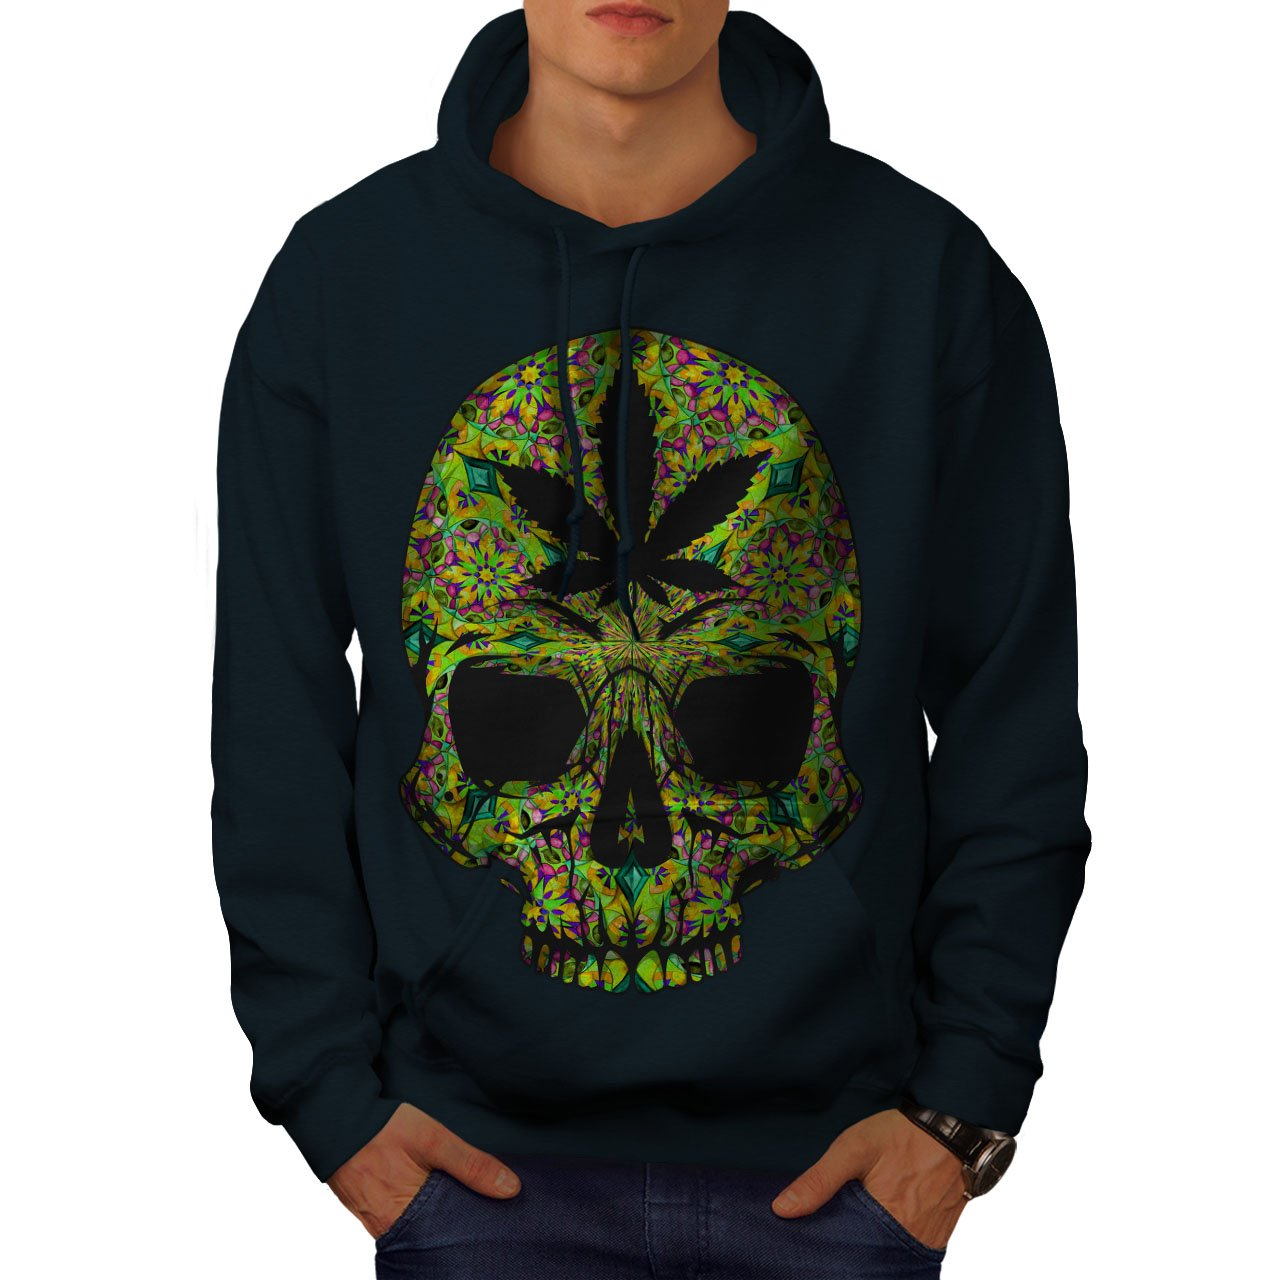 Wellcoda Skull Weed Stoner Rasta Mens Hoodie, Pot Denim Hooded Sweatshirt